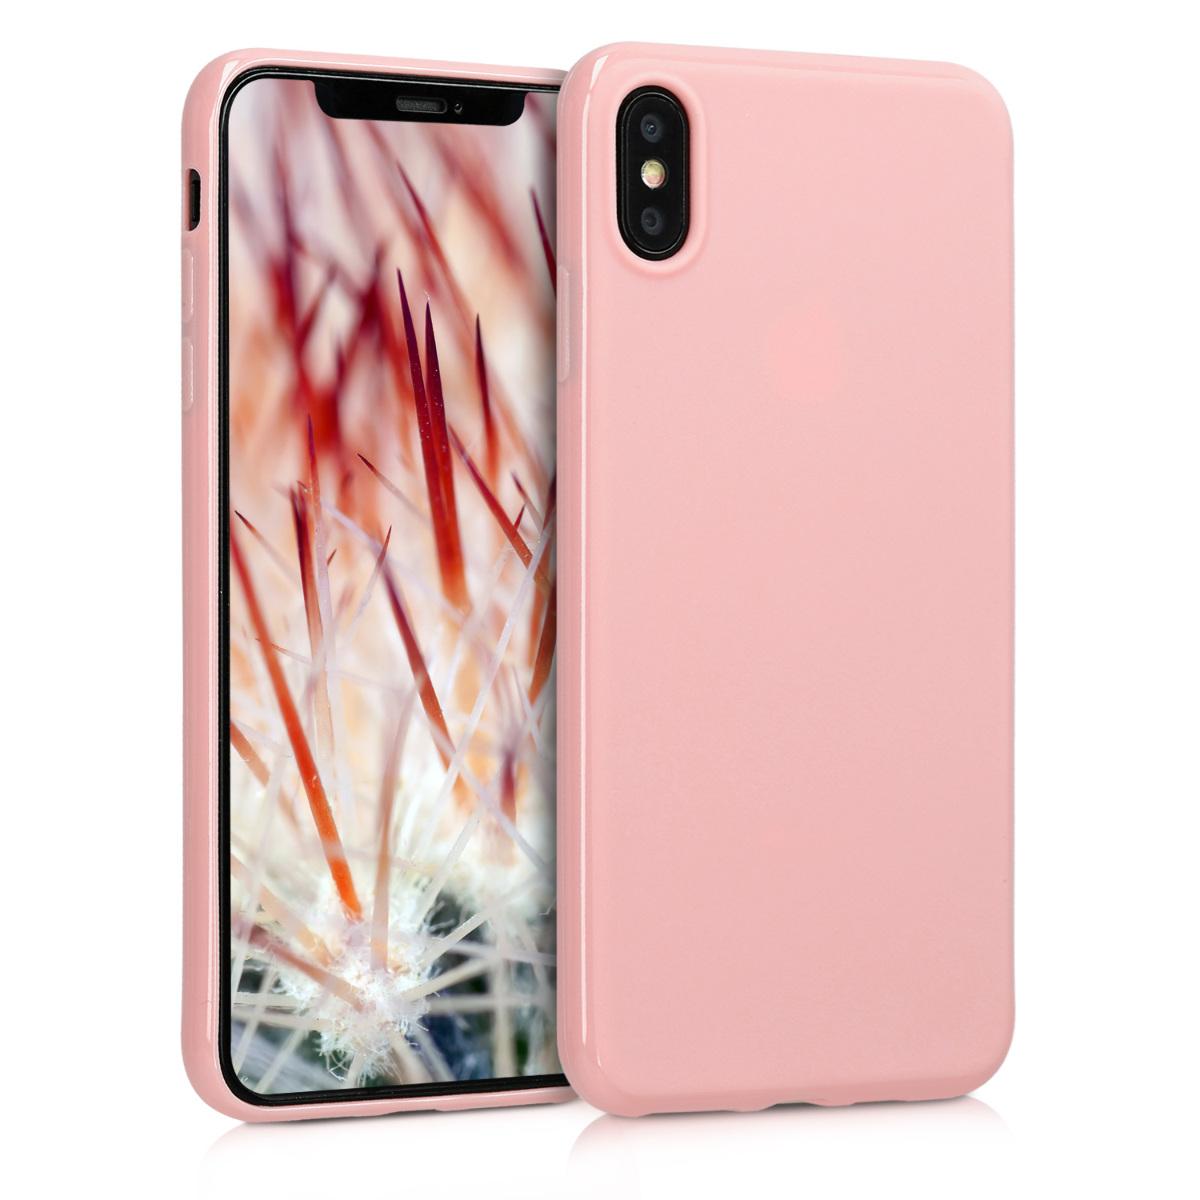 Kvalitní silikonové TPU pouzdro pro Apple iPhone XS Max - Rose Gold Matte